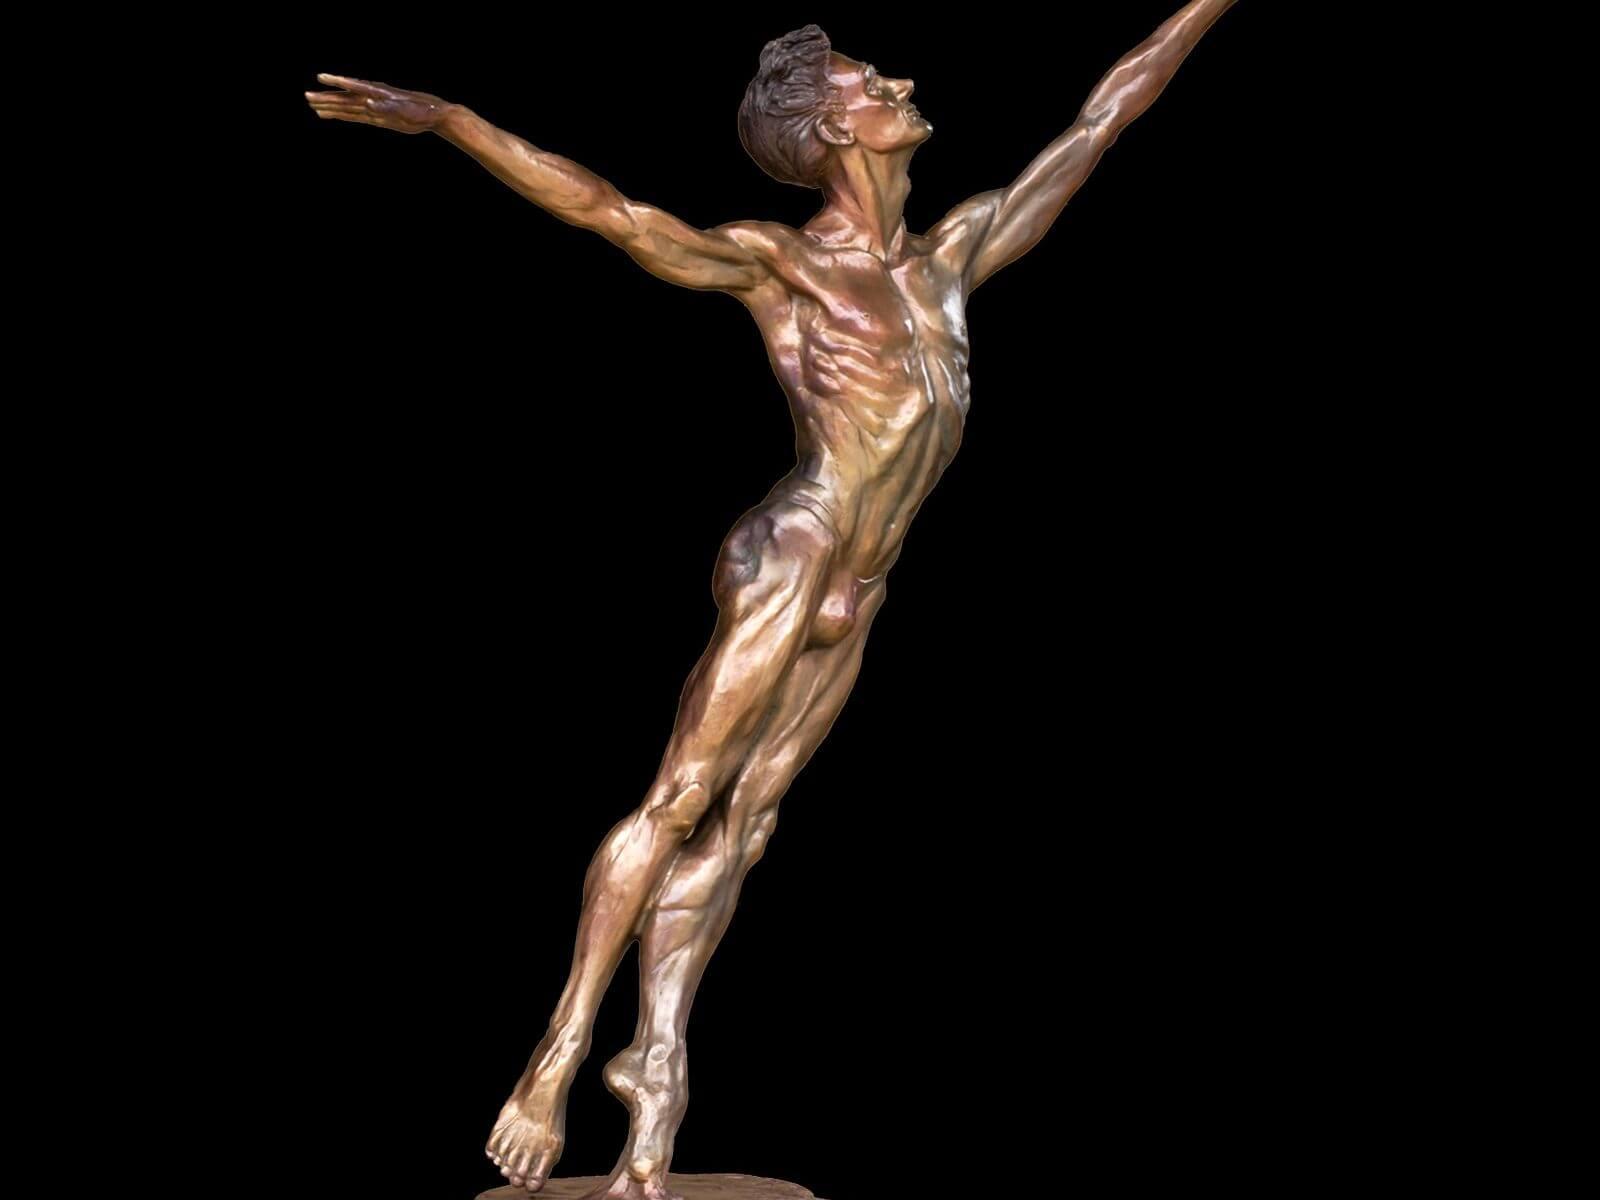 Destiny a medium size male bronze dance figurative sculpture by Andrew DeVries